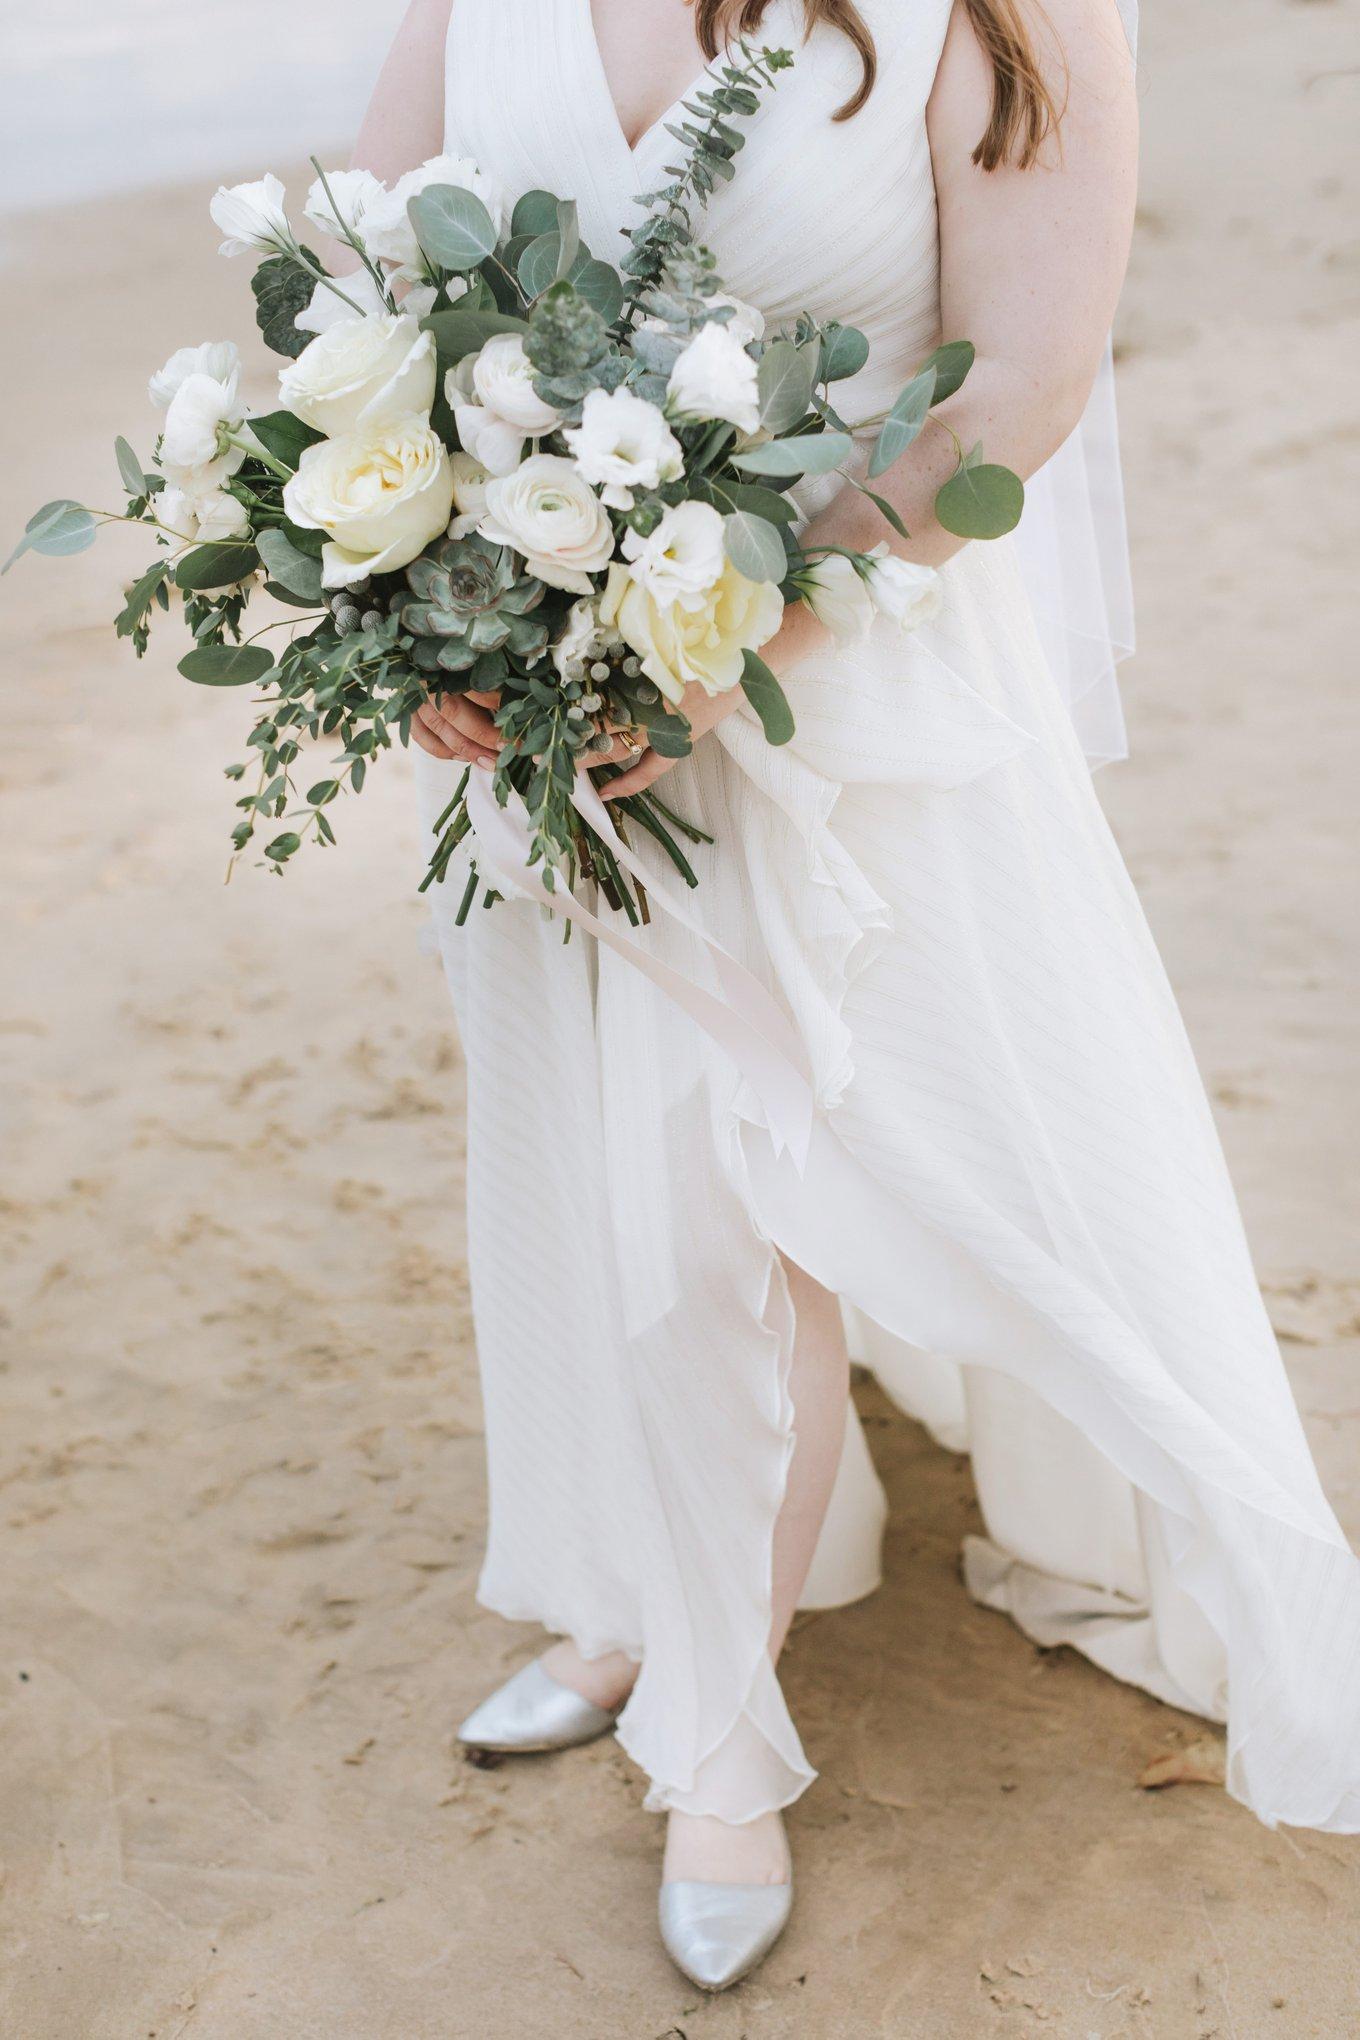 Newport-Wedding-Backyard-Photographer-26.jpg